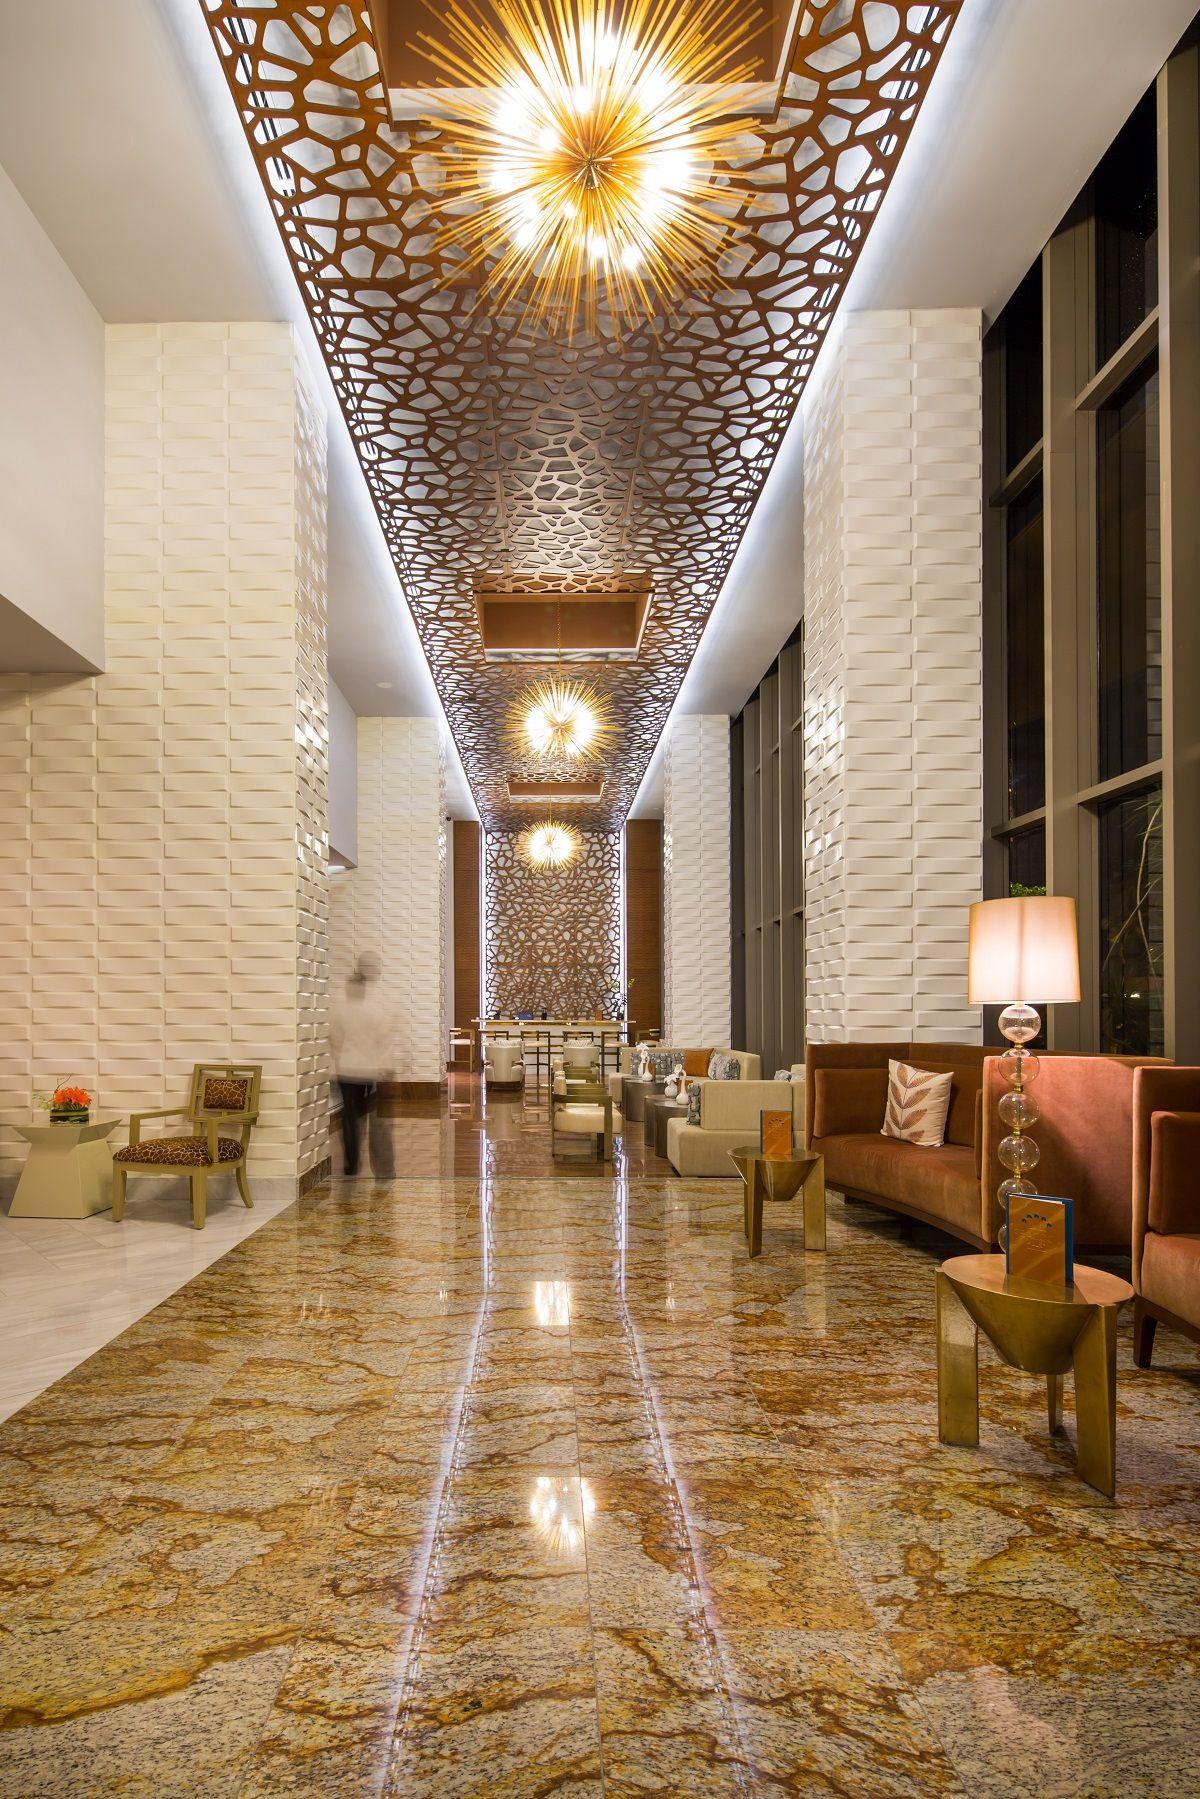 Waldorf Astoria Panama City Panama Perfectly